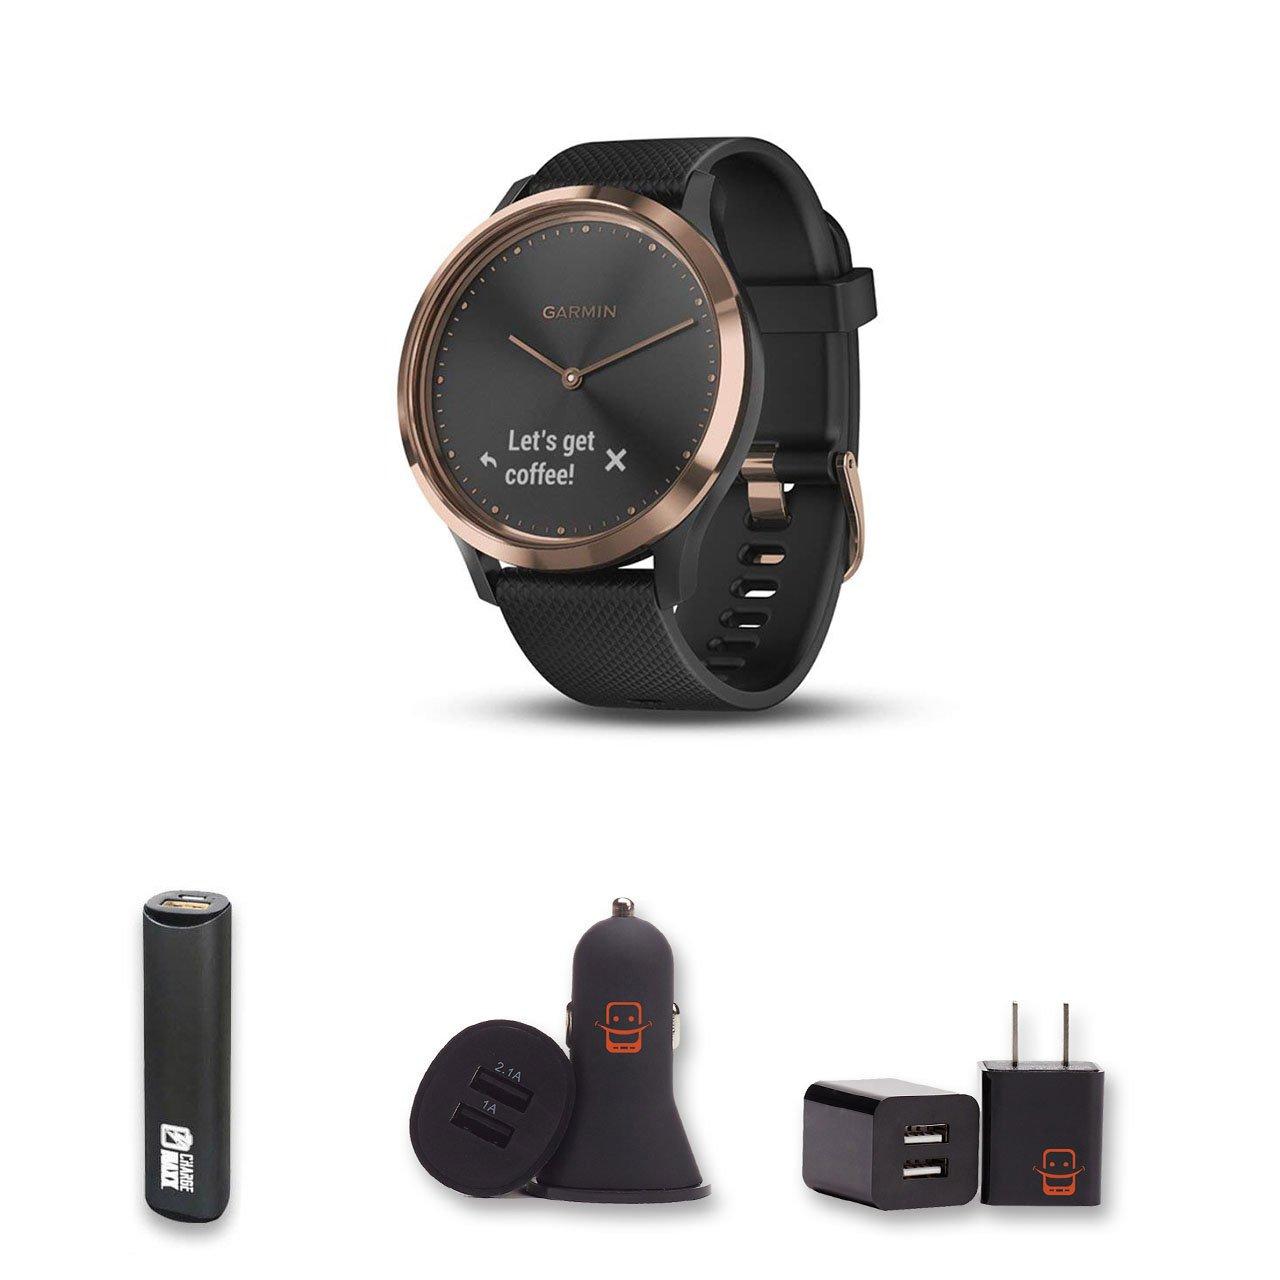 Garmin Vivomove HR Sport (Black/Rose Gold) Small/Medium Hybrid Smartwatch Bundle with PowerBank + USB Car Charger + USB Wall Charger (4 Items)